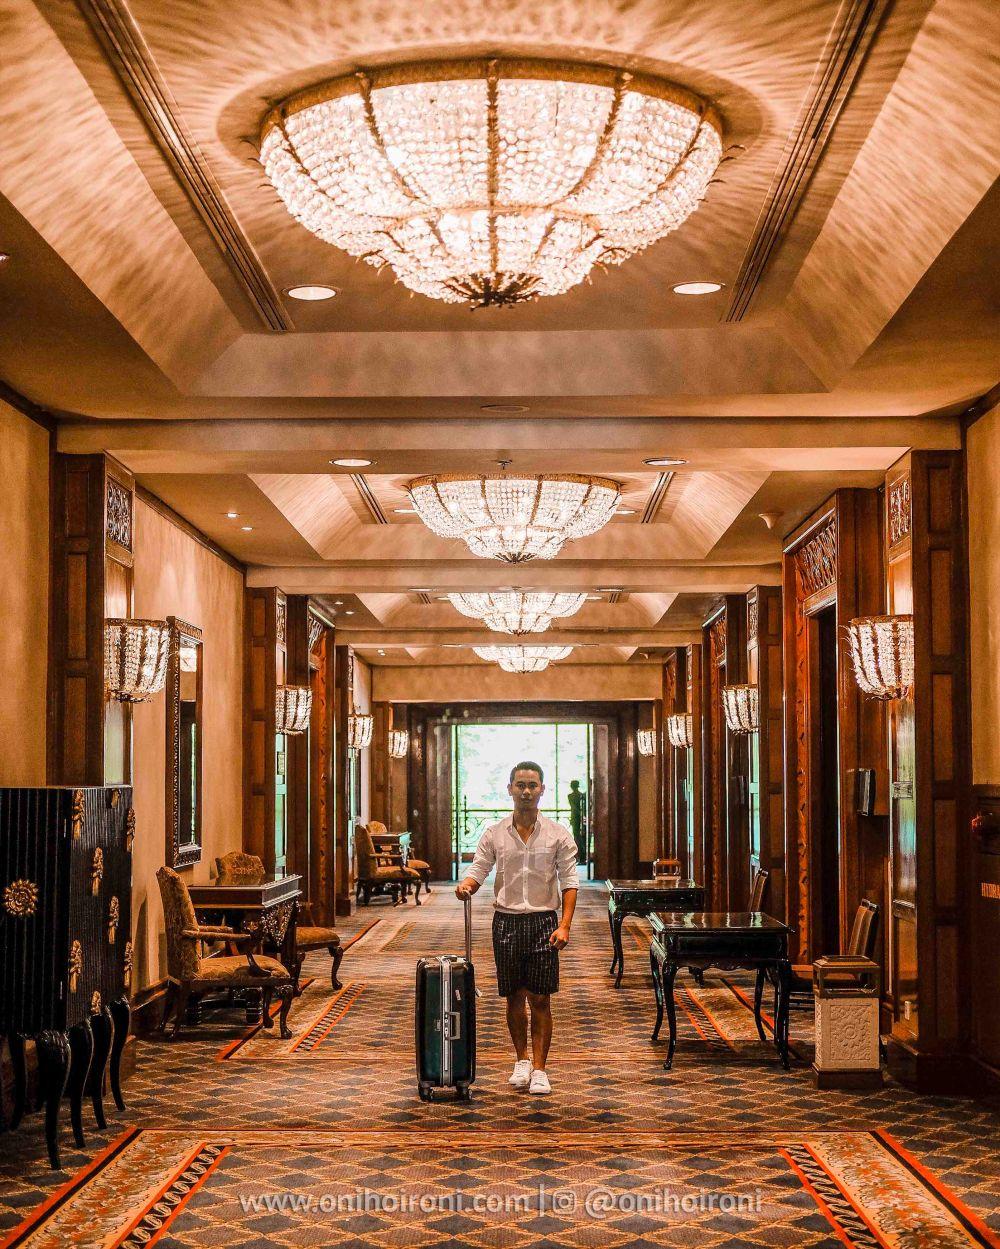 5 Review Lobby Shangrila Surabaya Hotel Oni hoironi